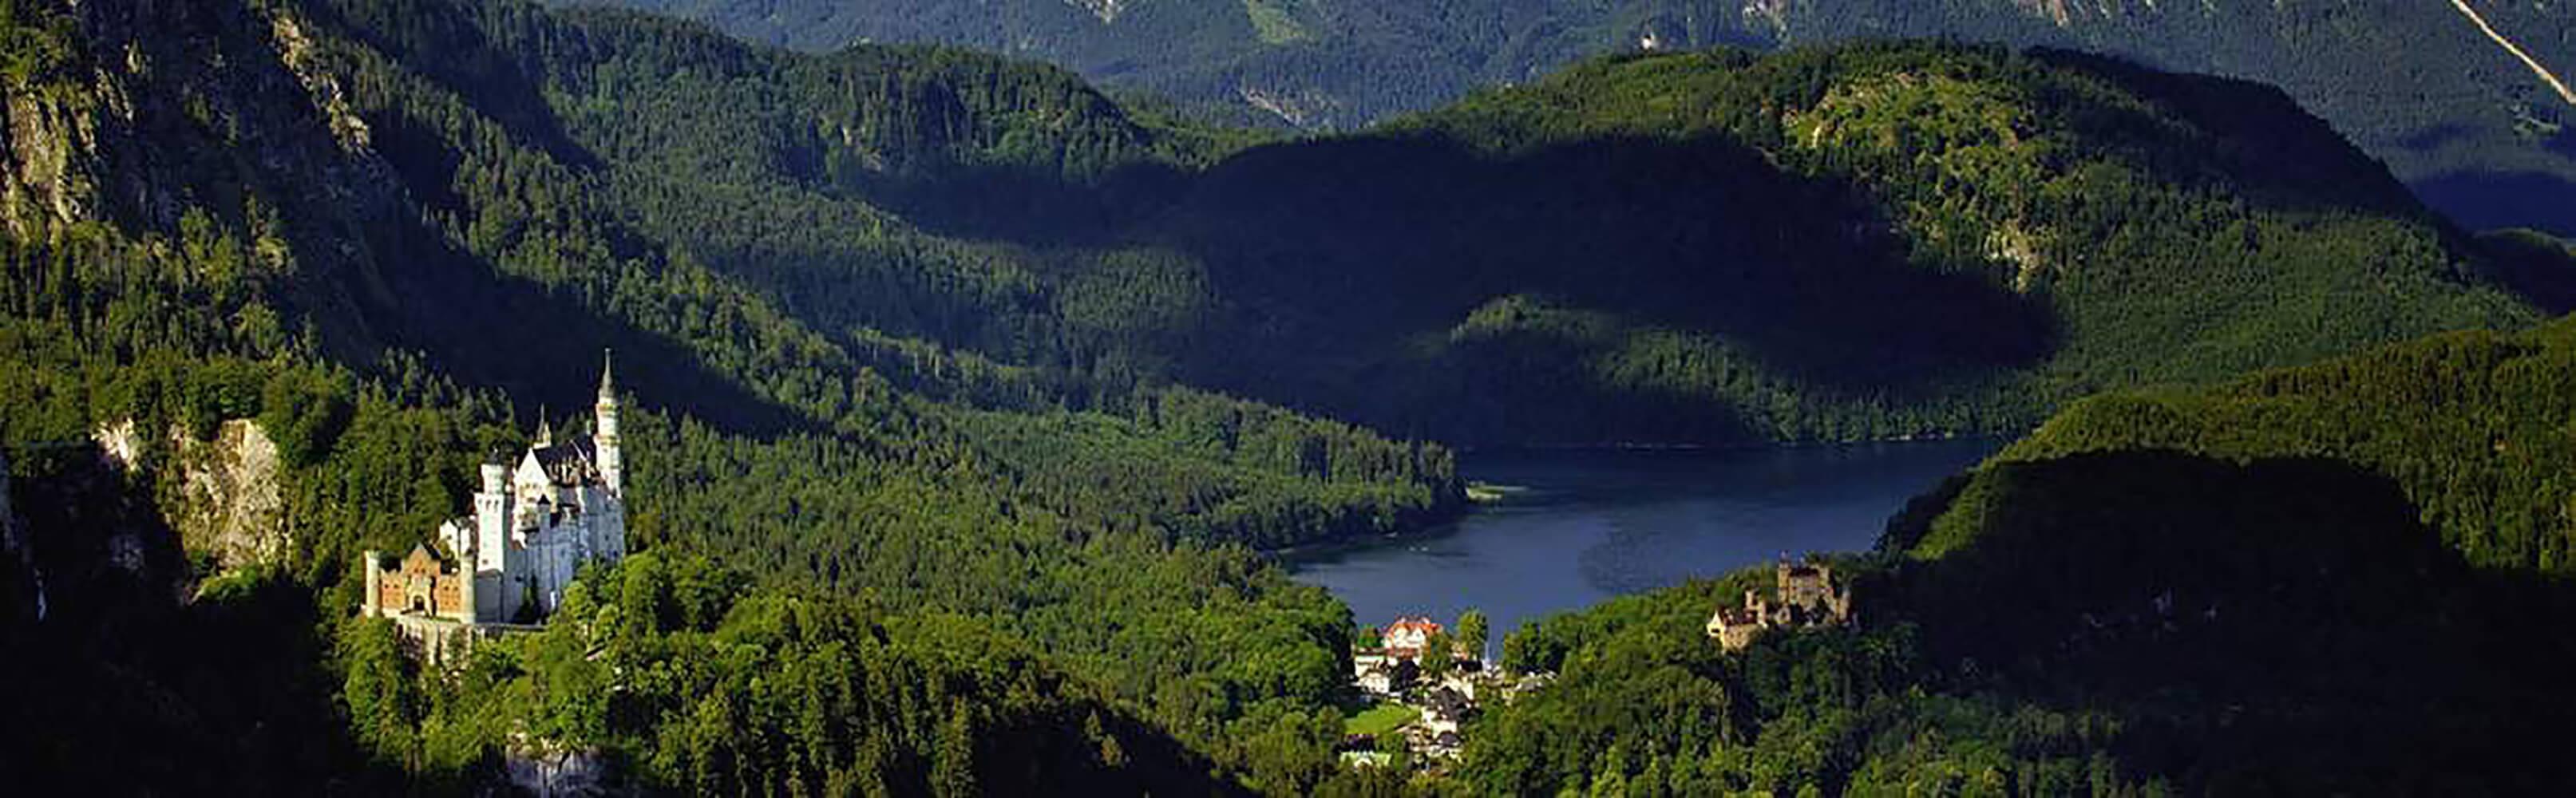 Schloss Neuschwanstein – das Märchenschloss in Schwangau 1